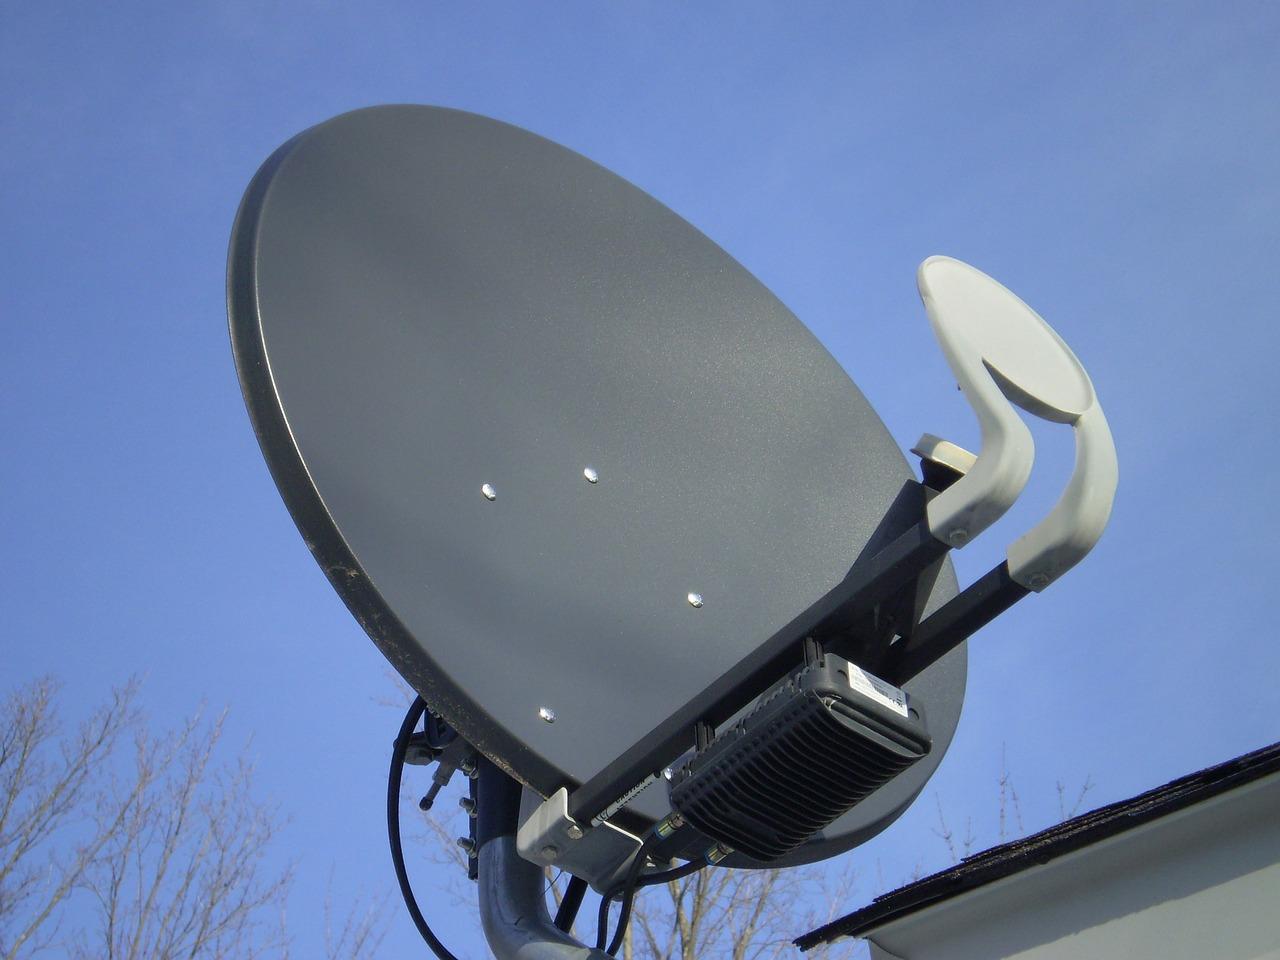 satellite mounted on roof